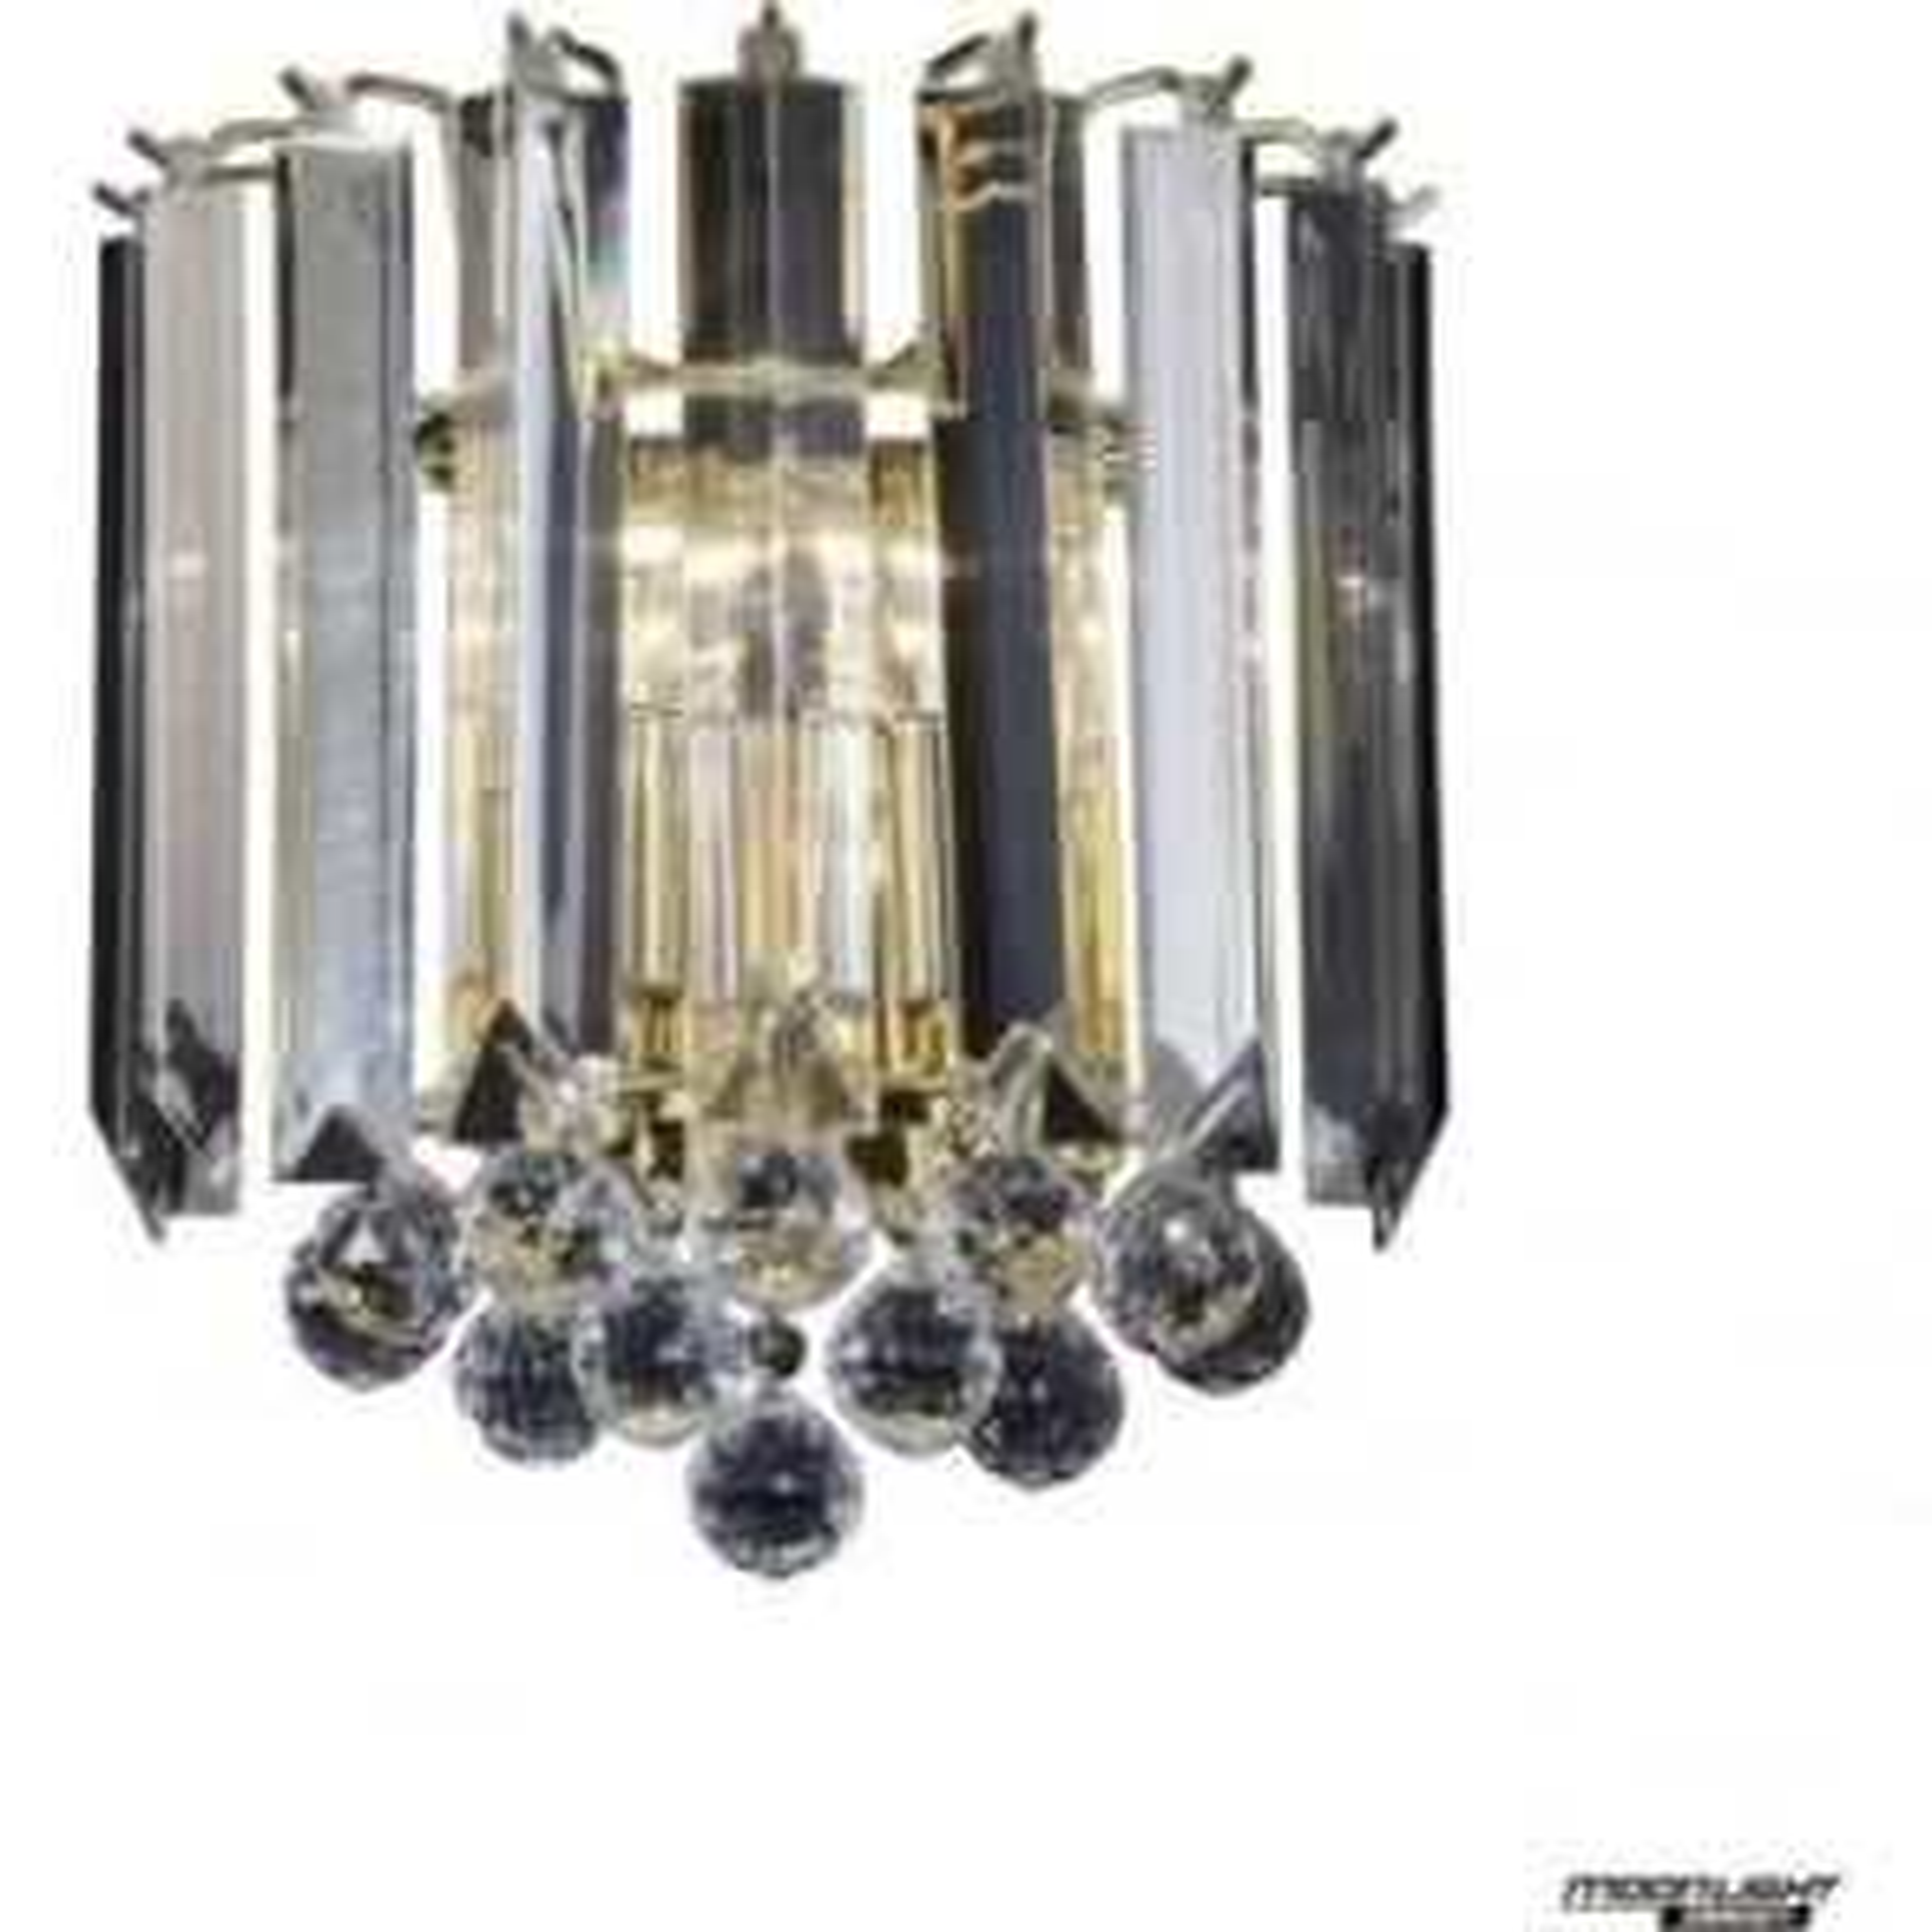 Fargo 2 Light wall fitting - Brass & clear acrylic